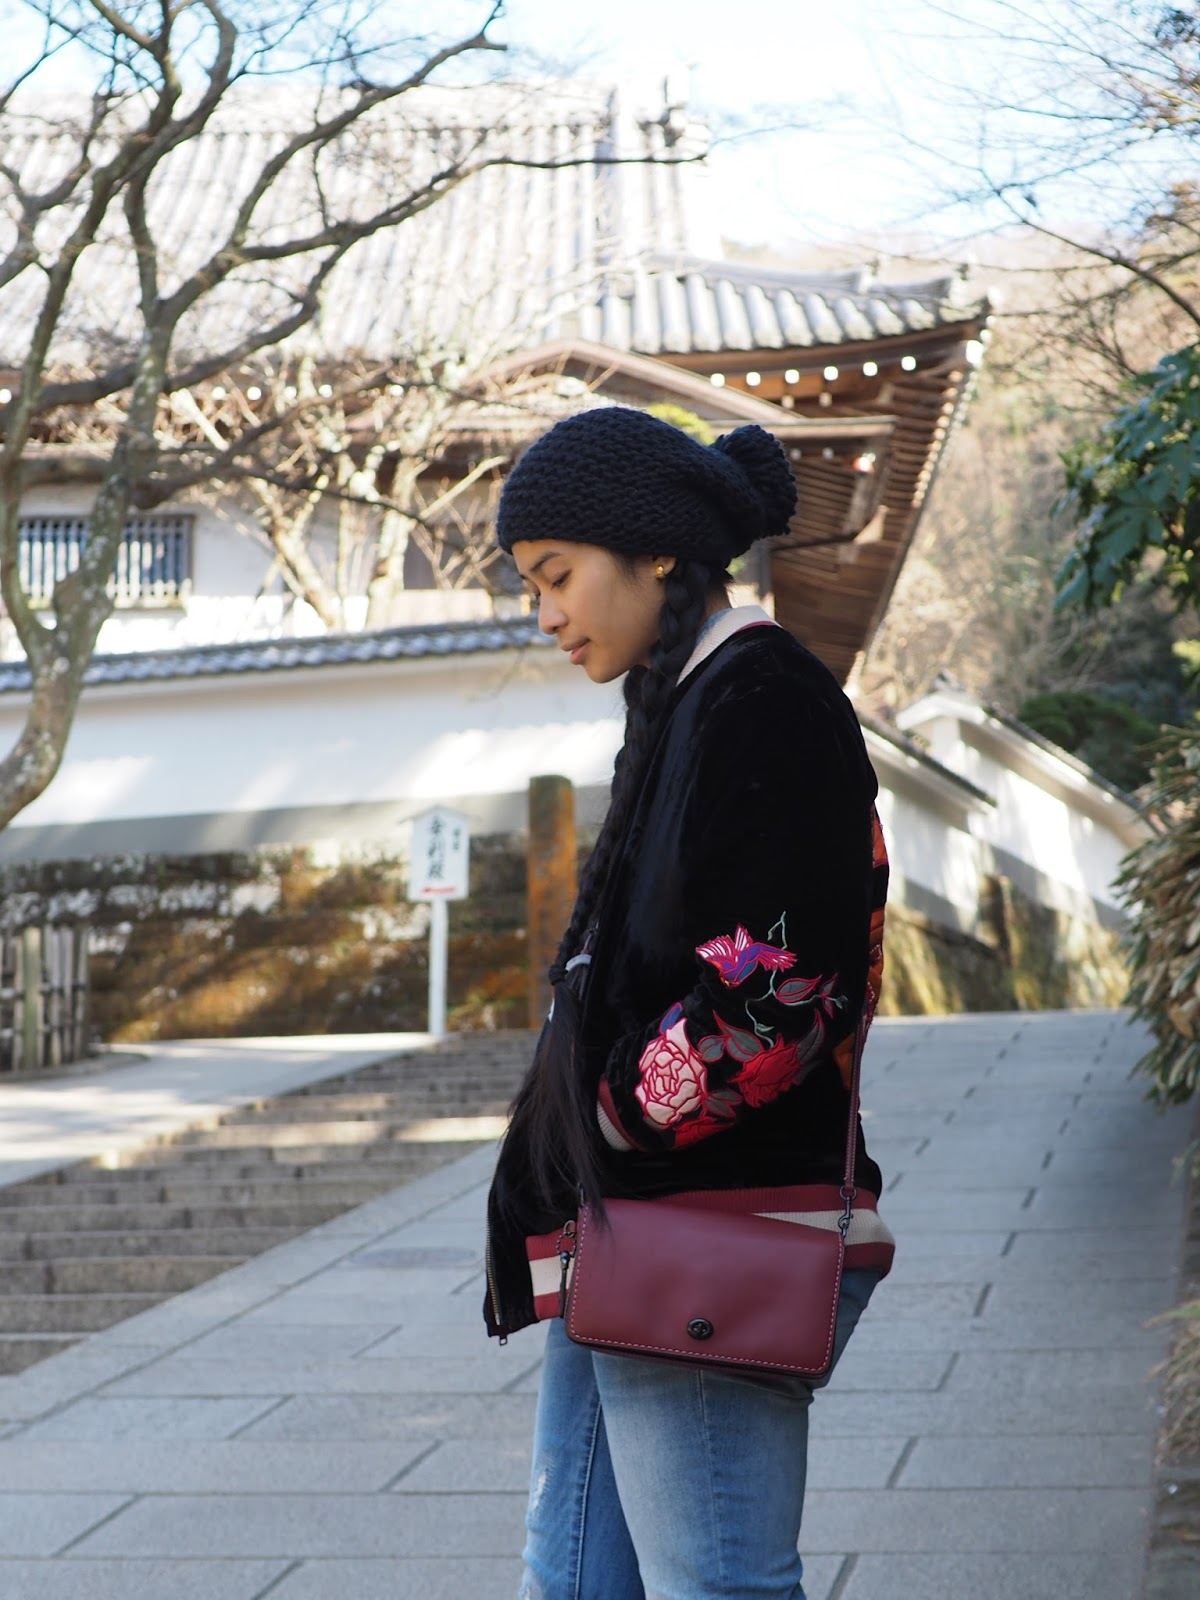 ootd urban outfitters fashion forever 21 japan tokyo kanagawa kamakura Coach Dinky